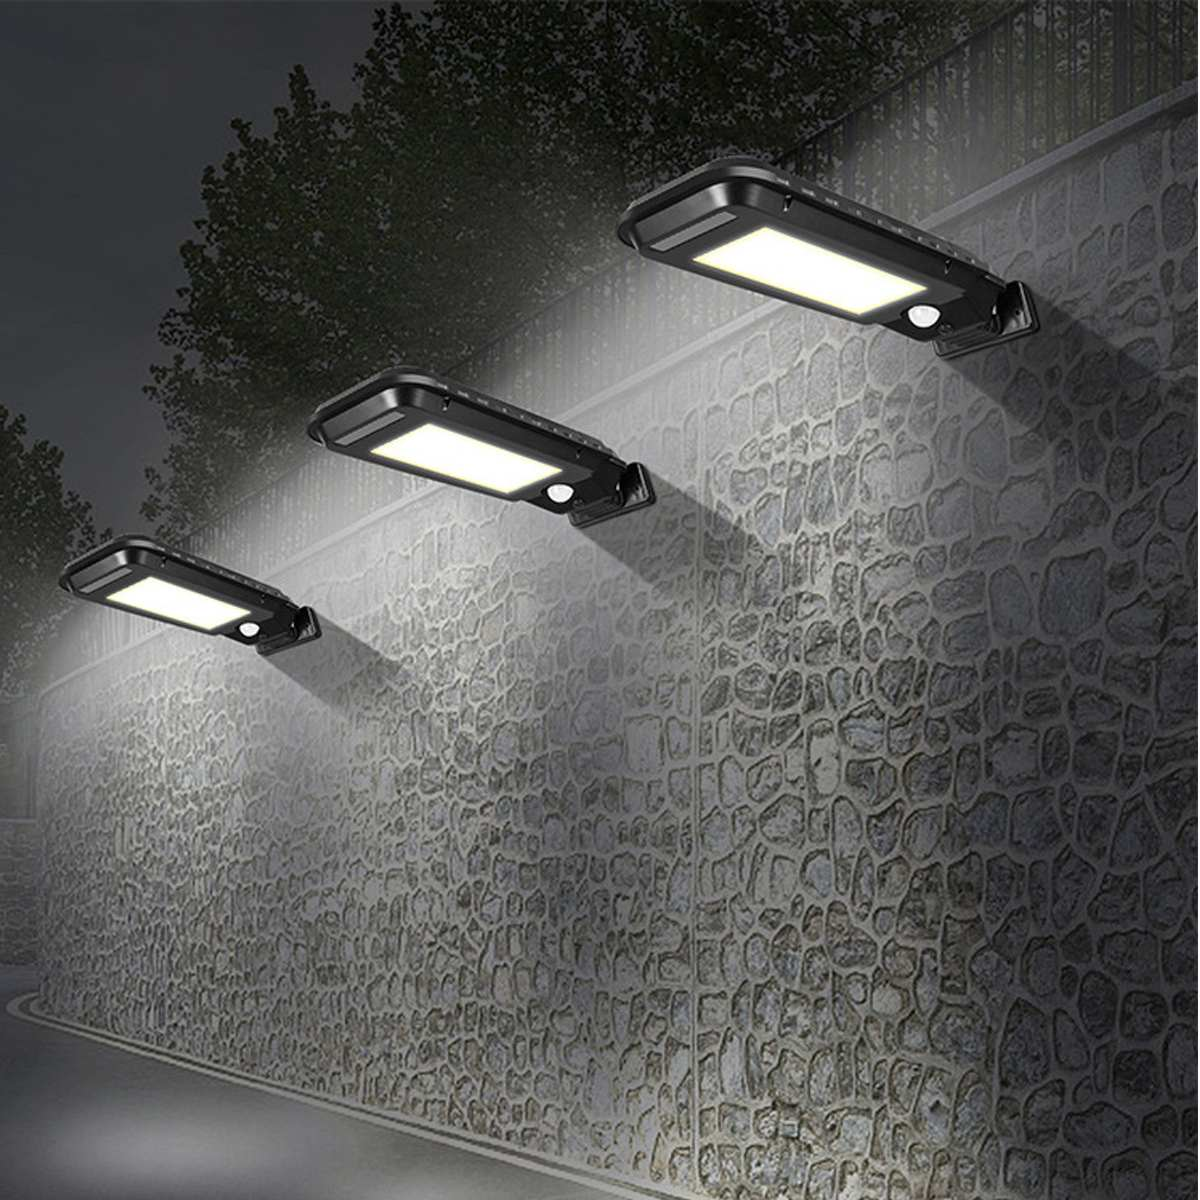 40/60 Led Solar-straßenlaternen 100/210 COB Outdoor Beleuchtung Sicherheits Lampe Motion Sensor Wasserdichte IP65 Weiß/Gelb Wand Lampe